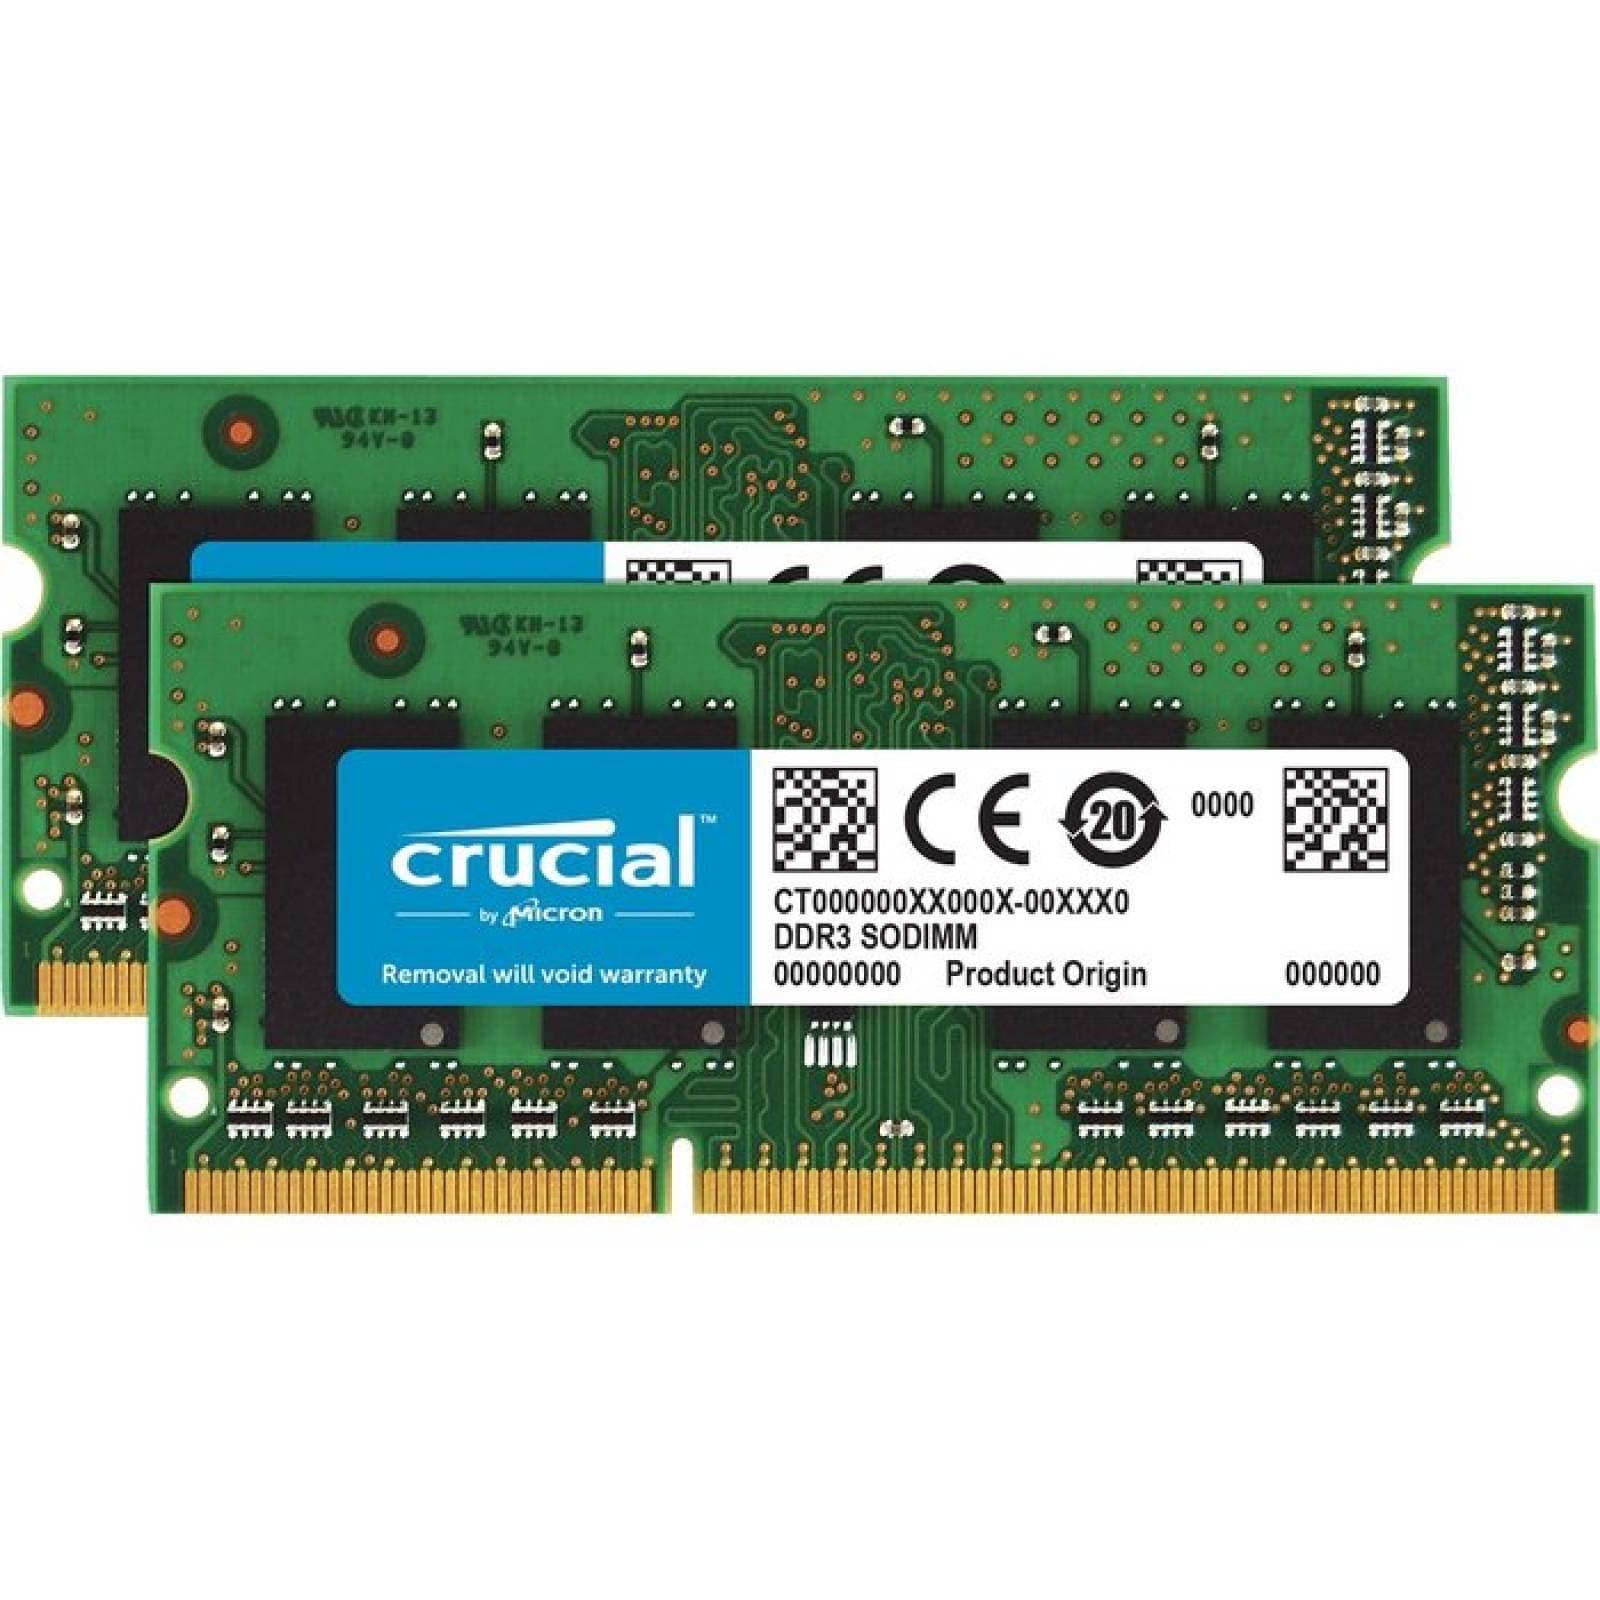 Mdulo de memoria SDRAM DDR3 de 16 GB (2 x 8 GB) crucial